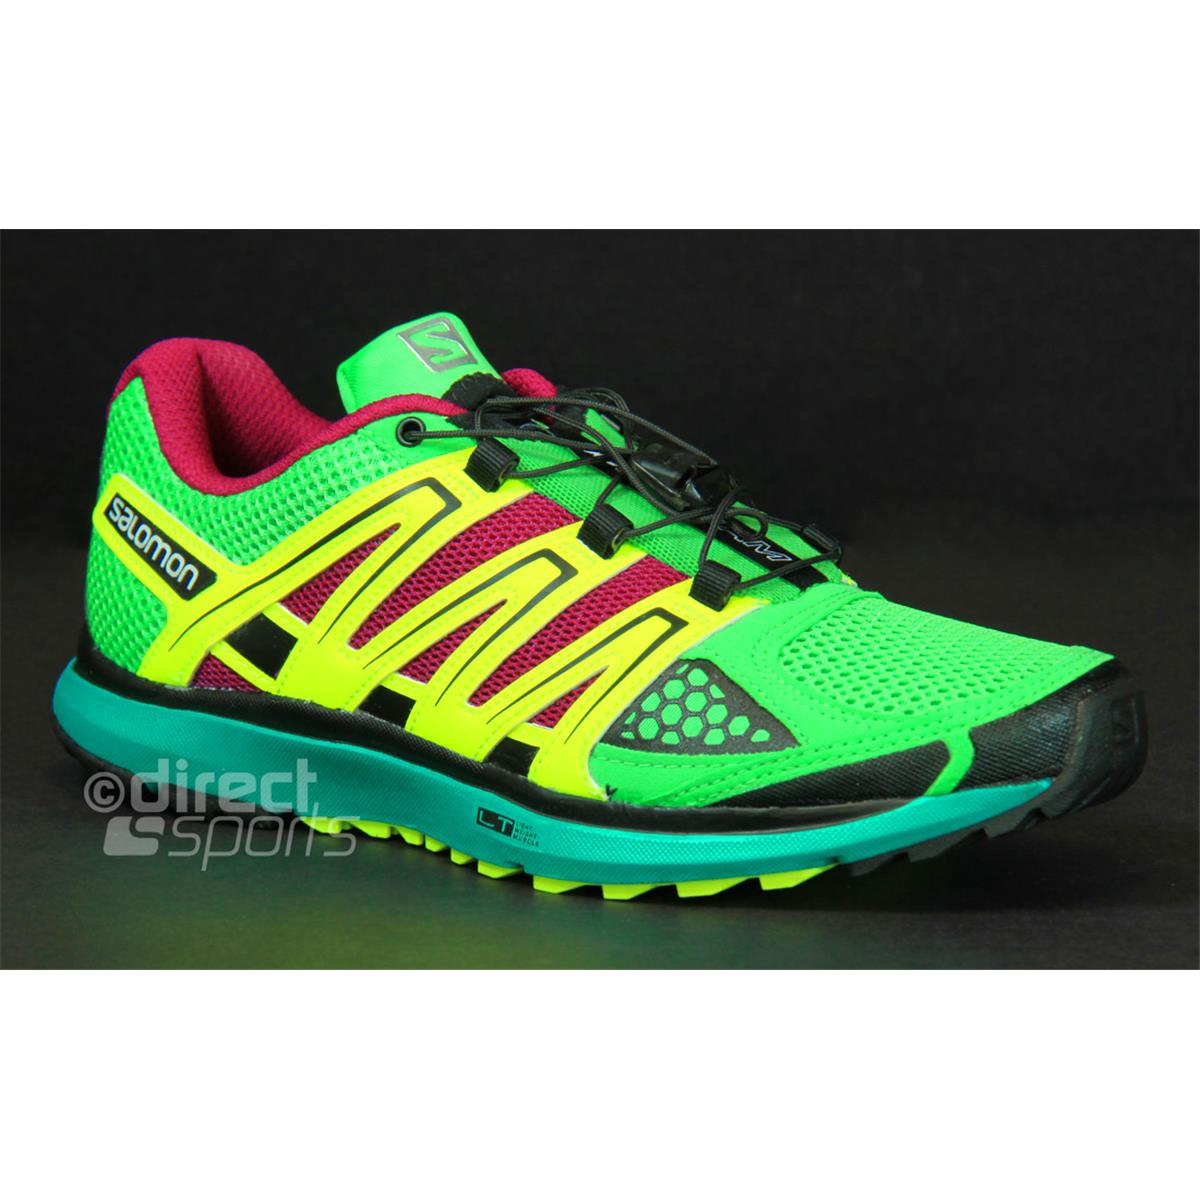 Salomon X Scream Womens Running Shoes Review